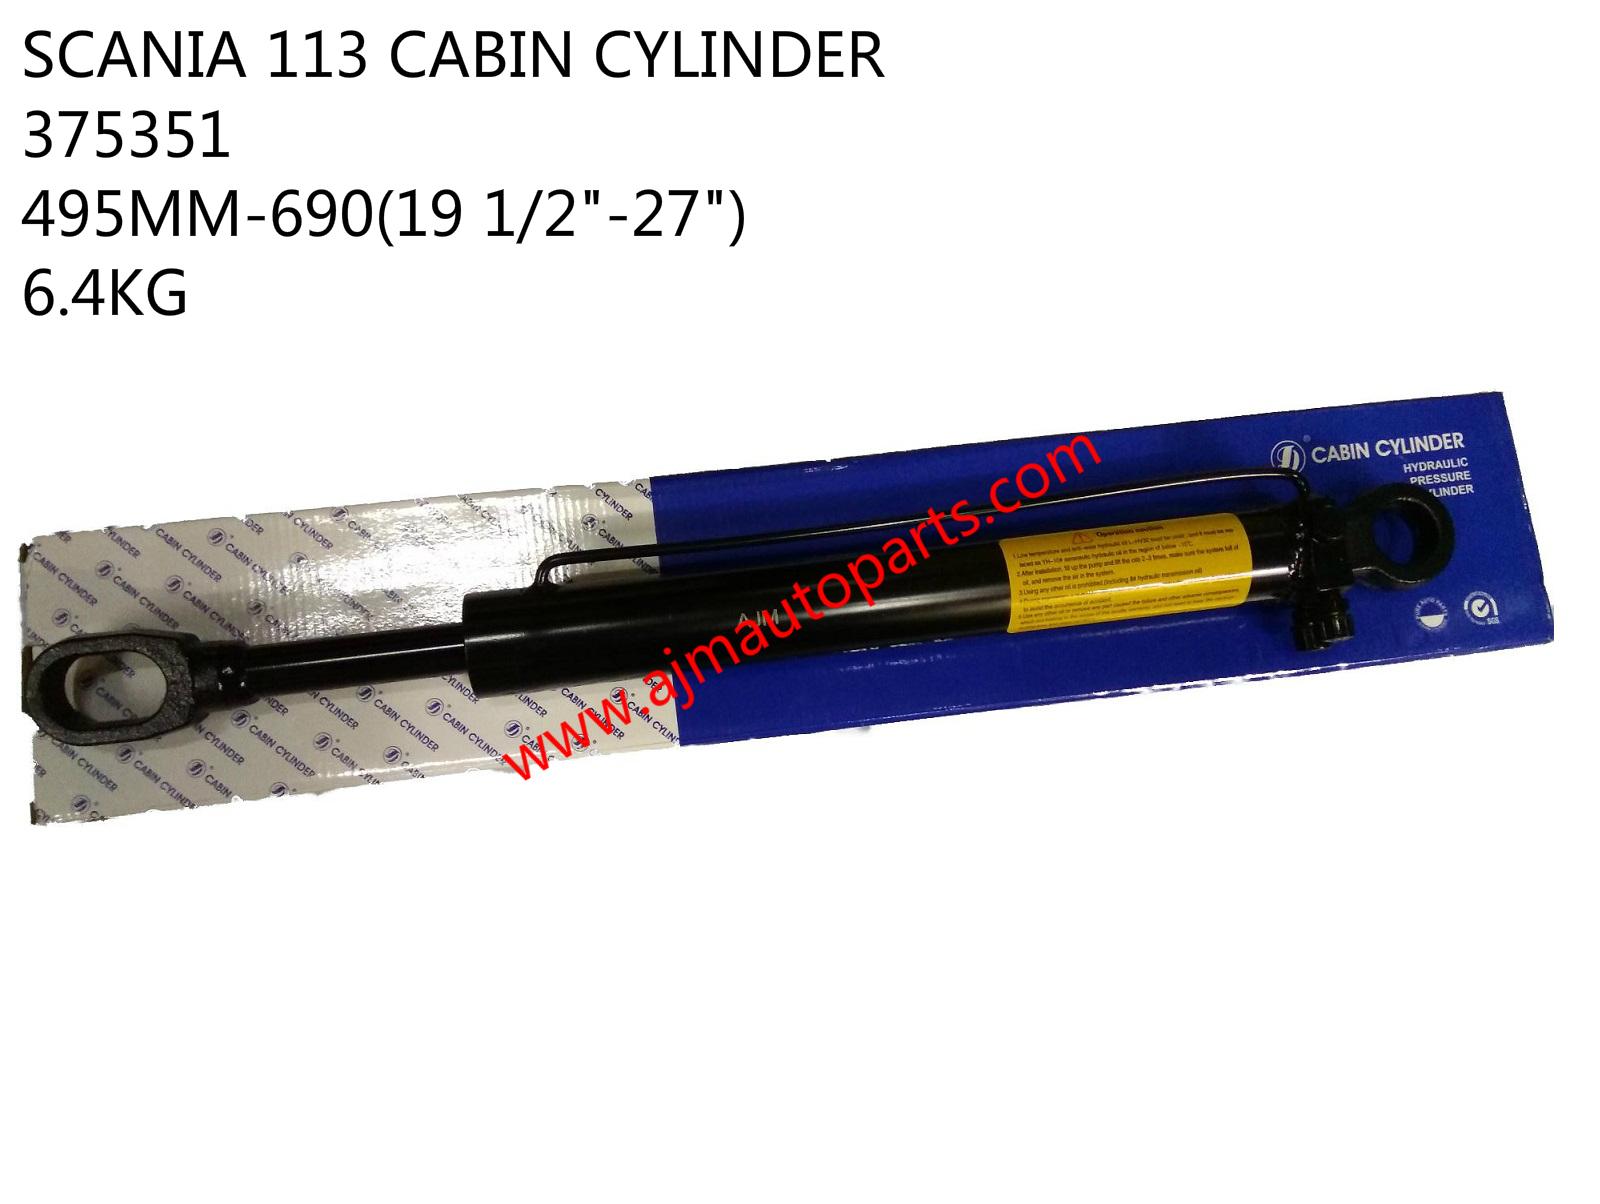 SCANIA_113_CABIN_CYLINDER-375351